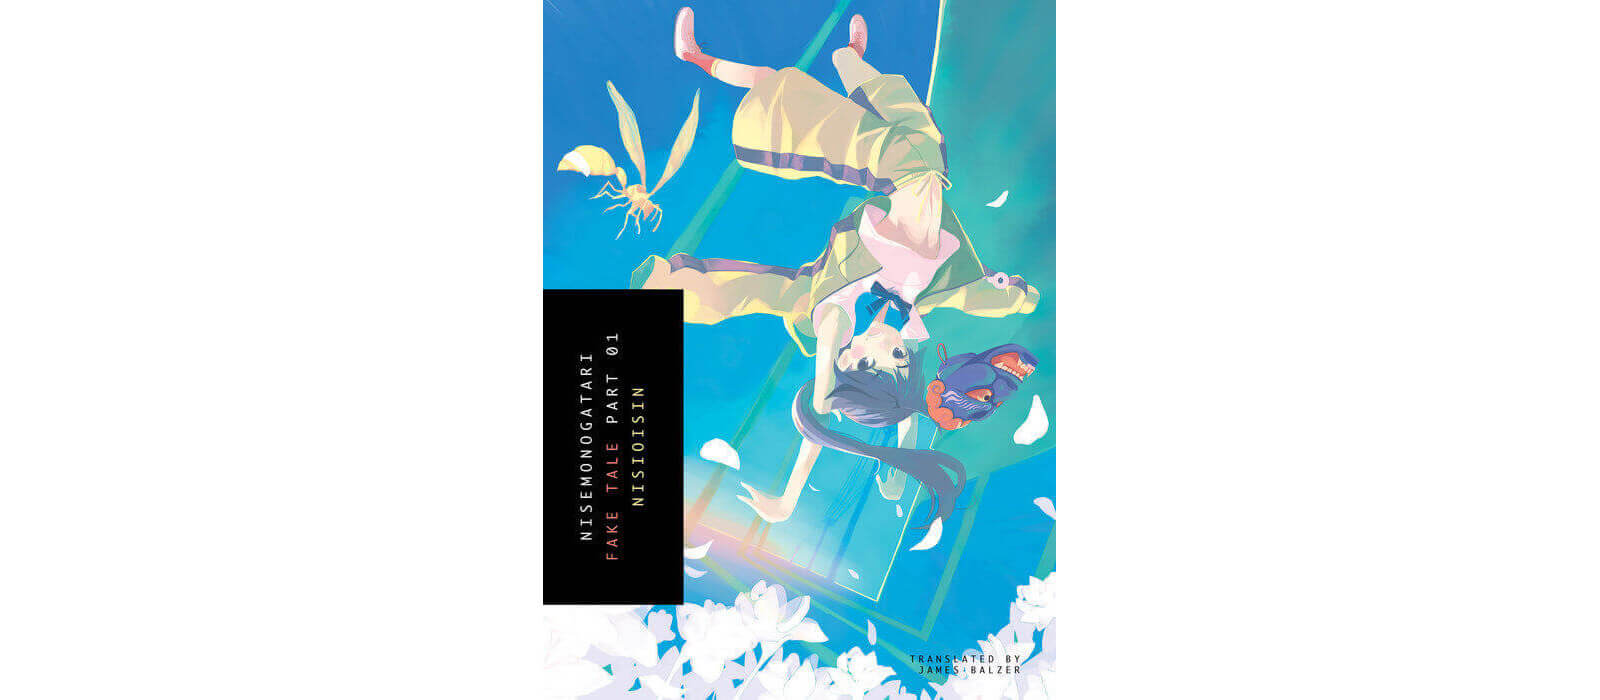 June 2017 Manga Releases - Nisemonogatari Volume 1